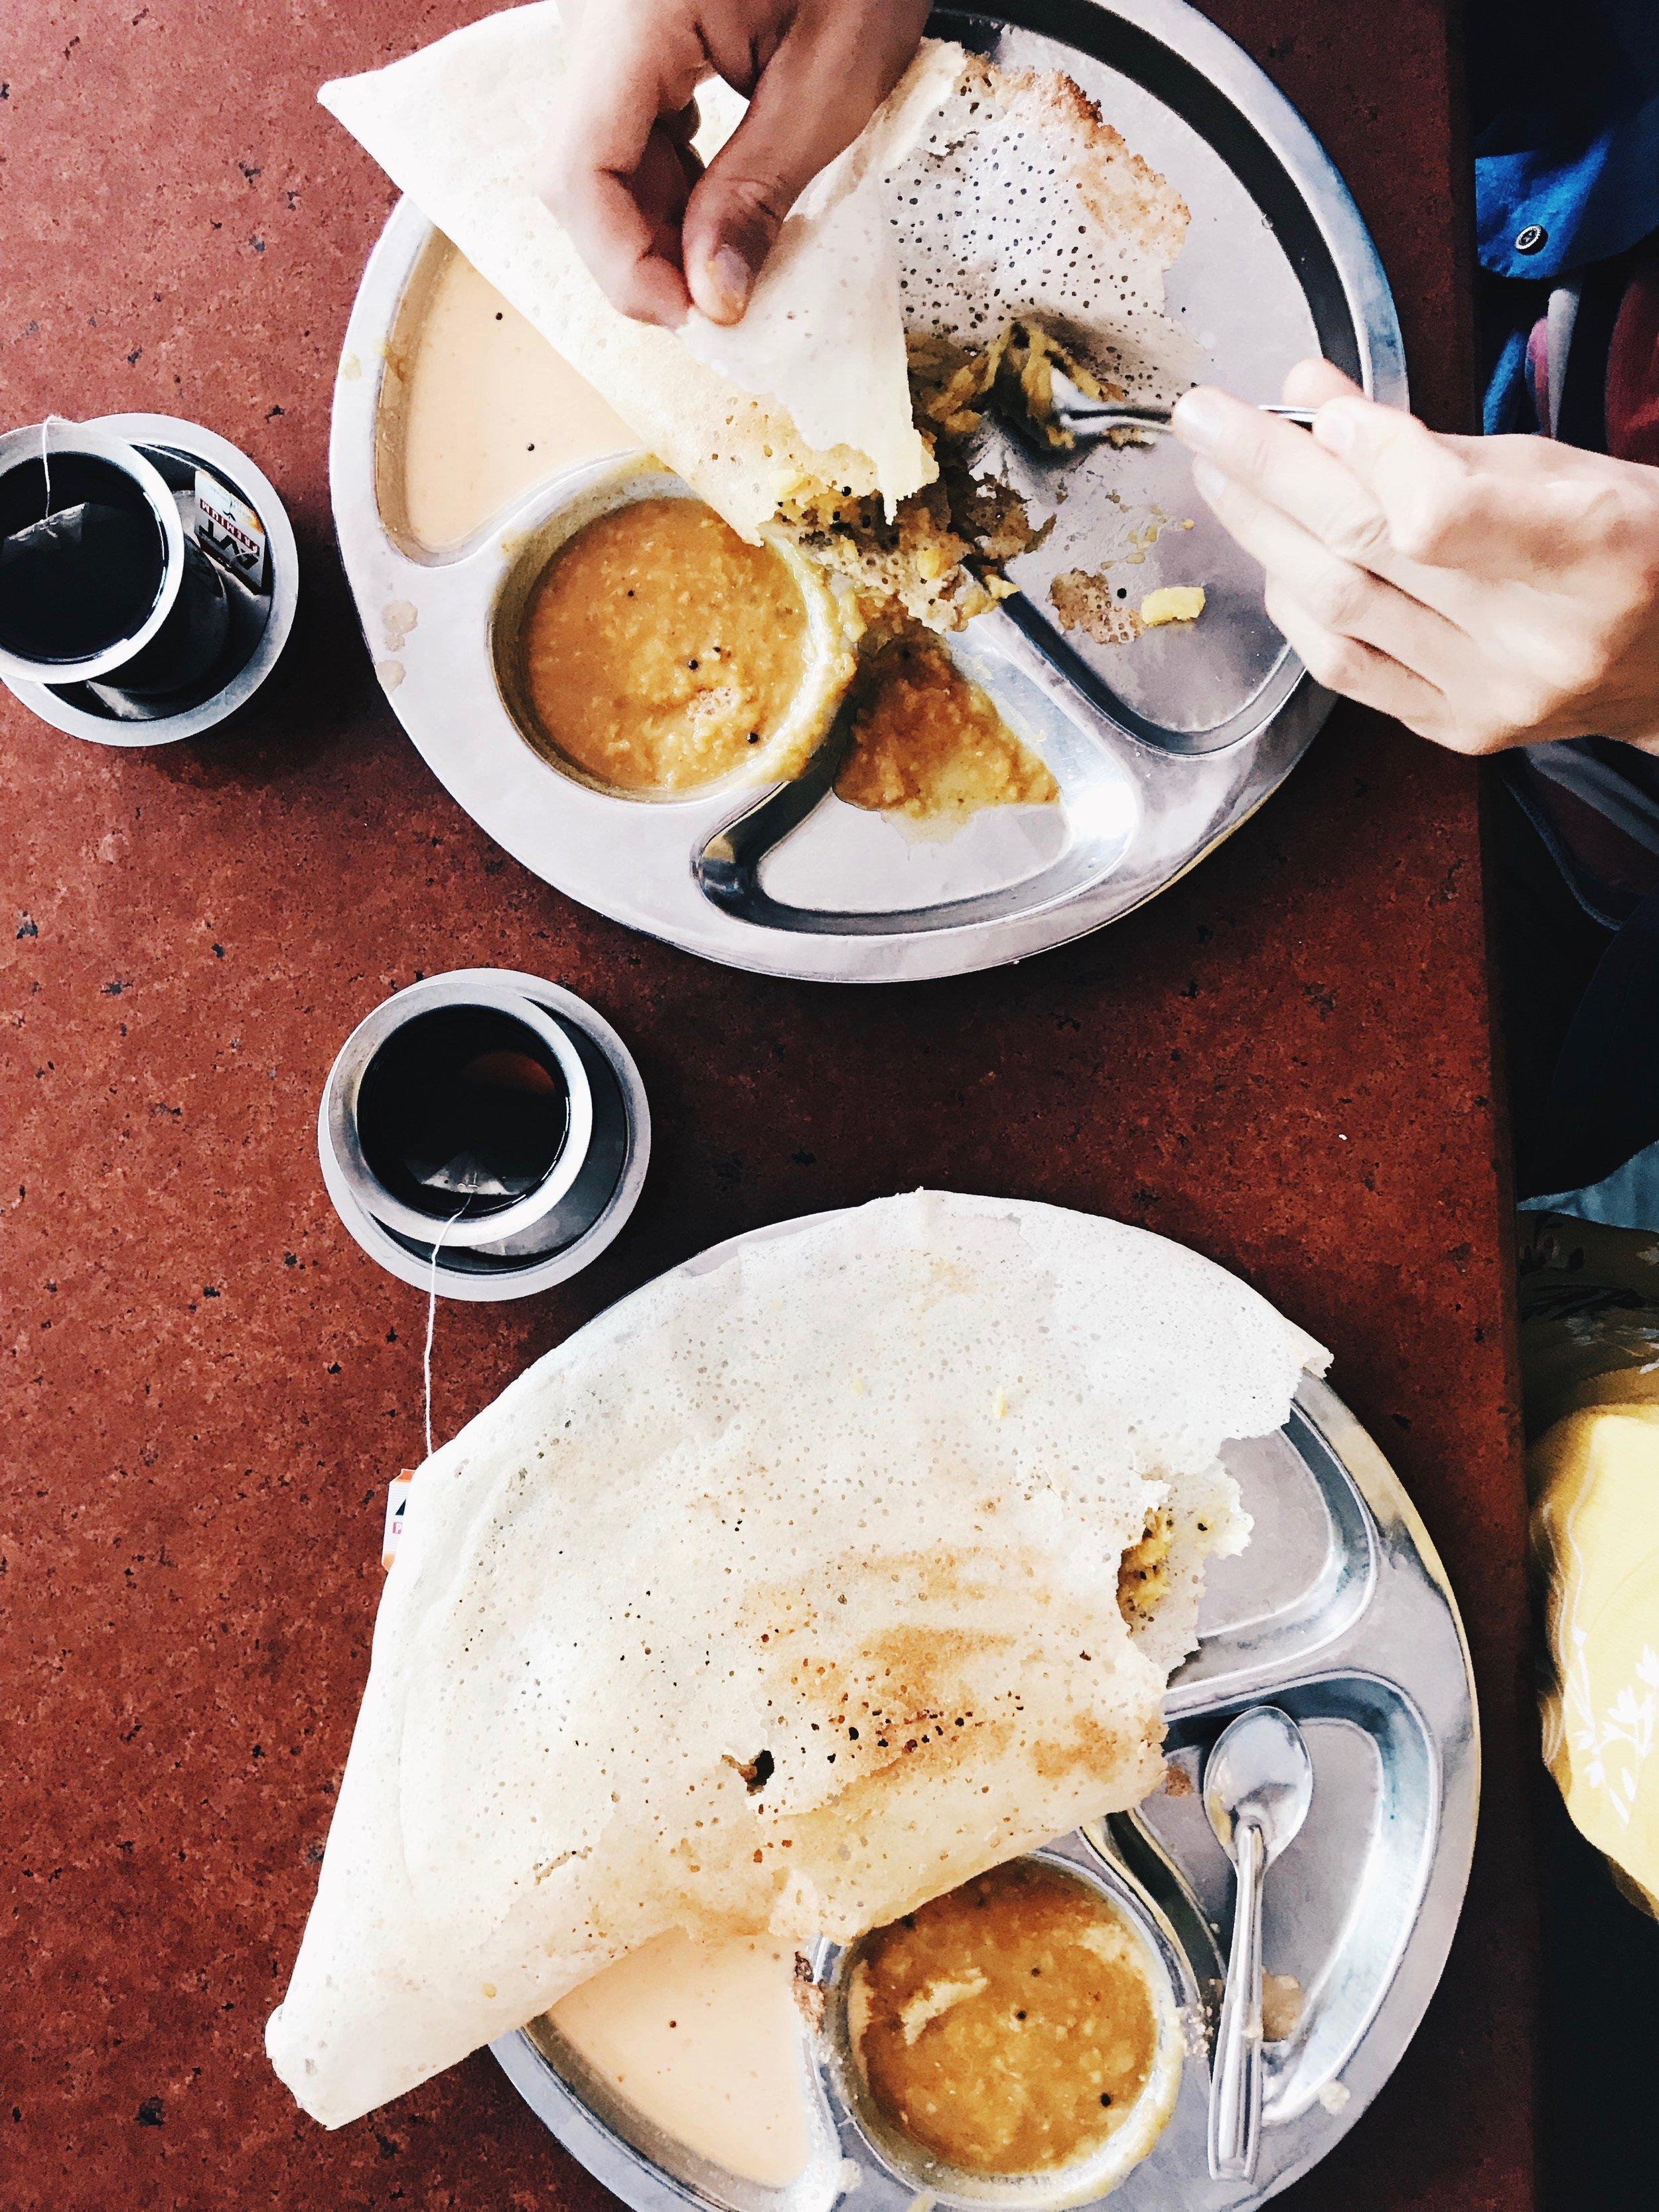 Masala Dosa at Sri Krishna Cafe - Mattancherry